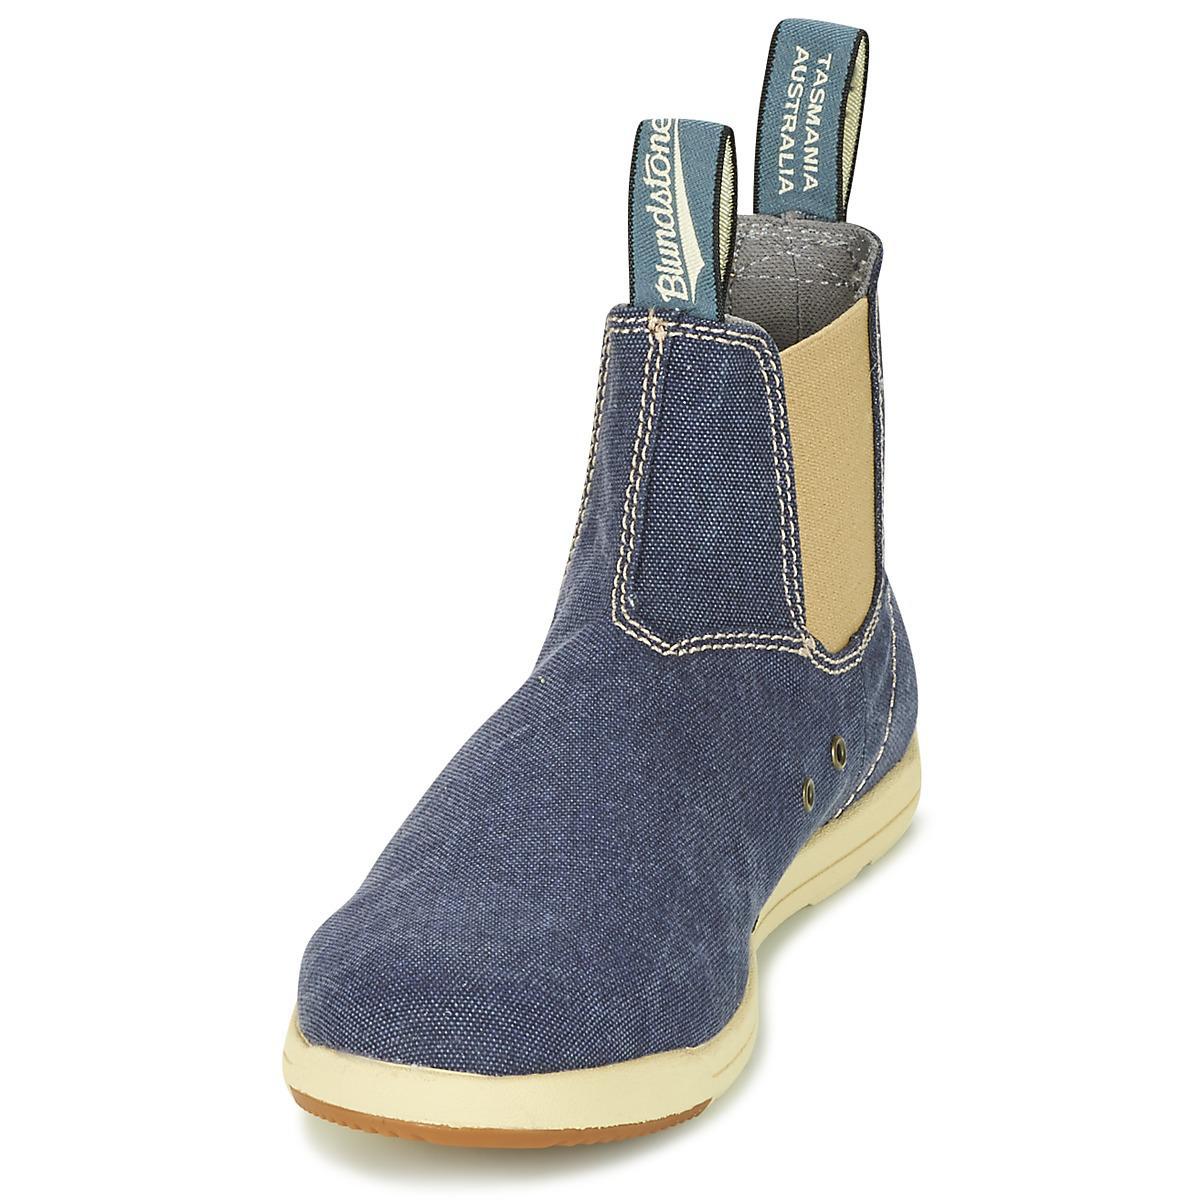 Blundstone Eva Chelsea Boot Women's Mid Boots In Blue